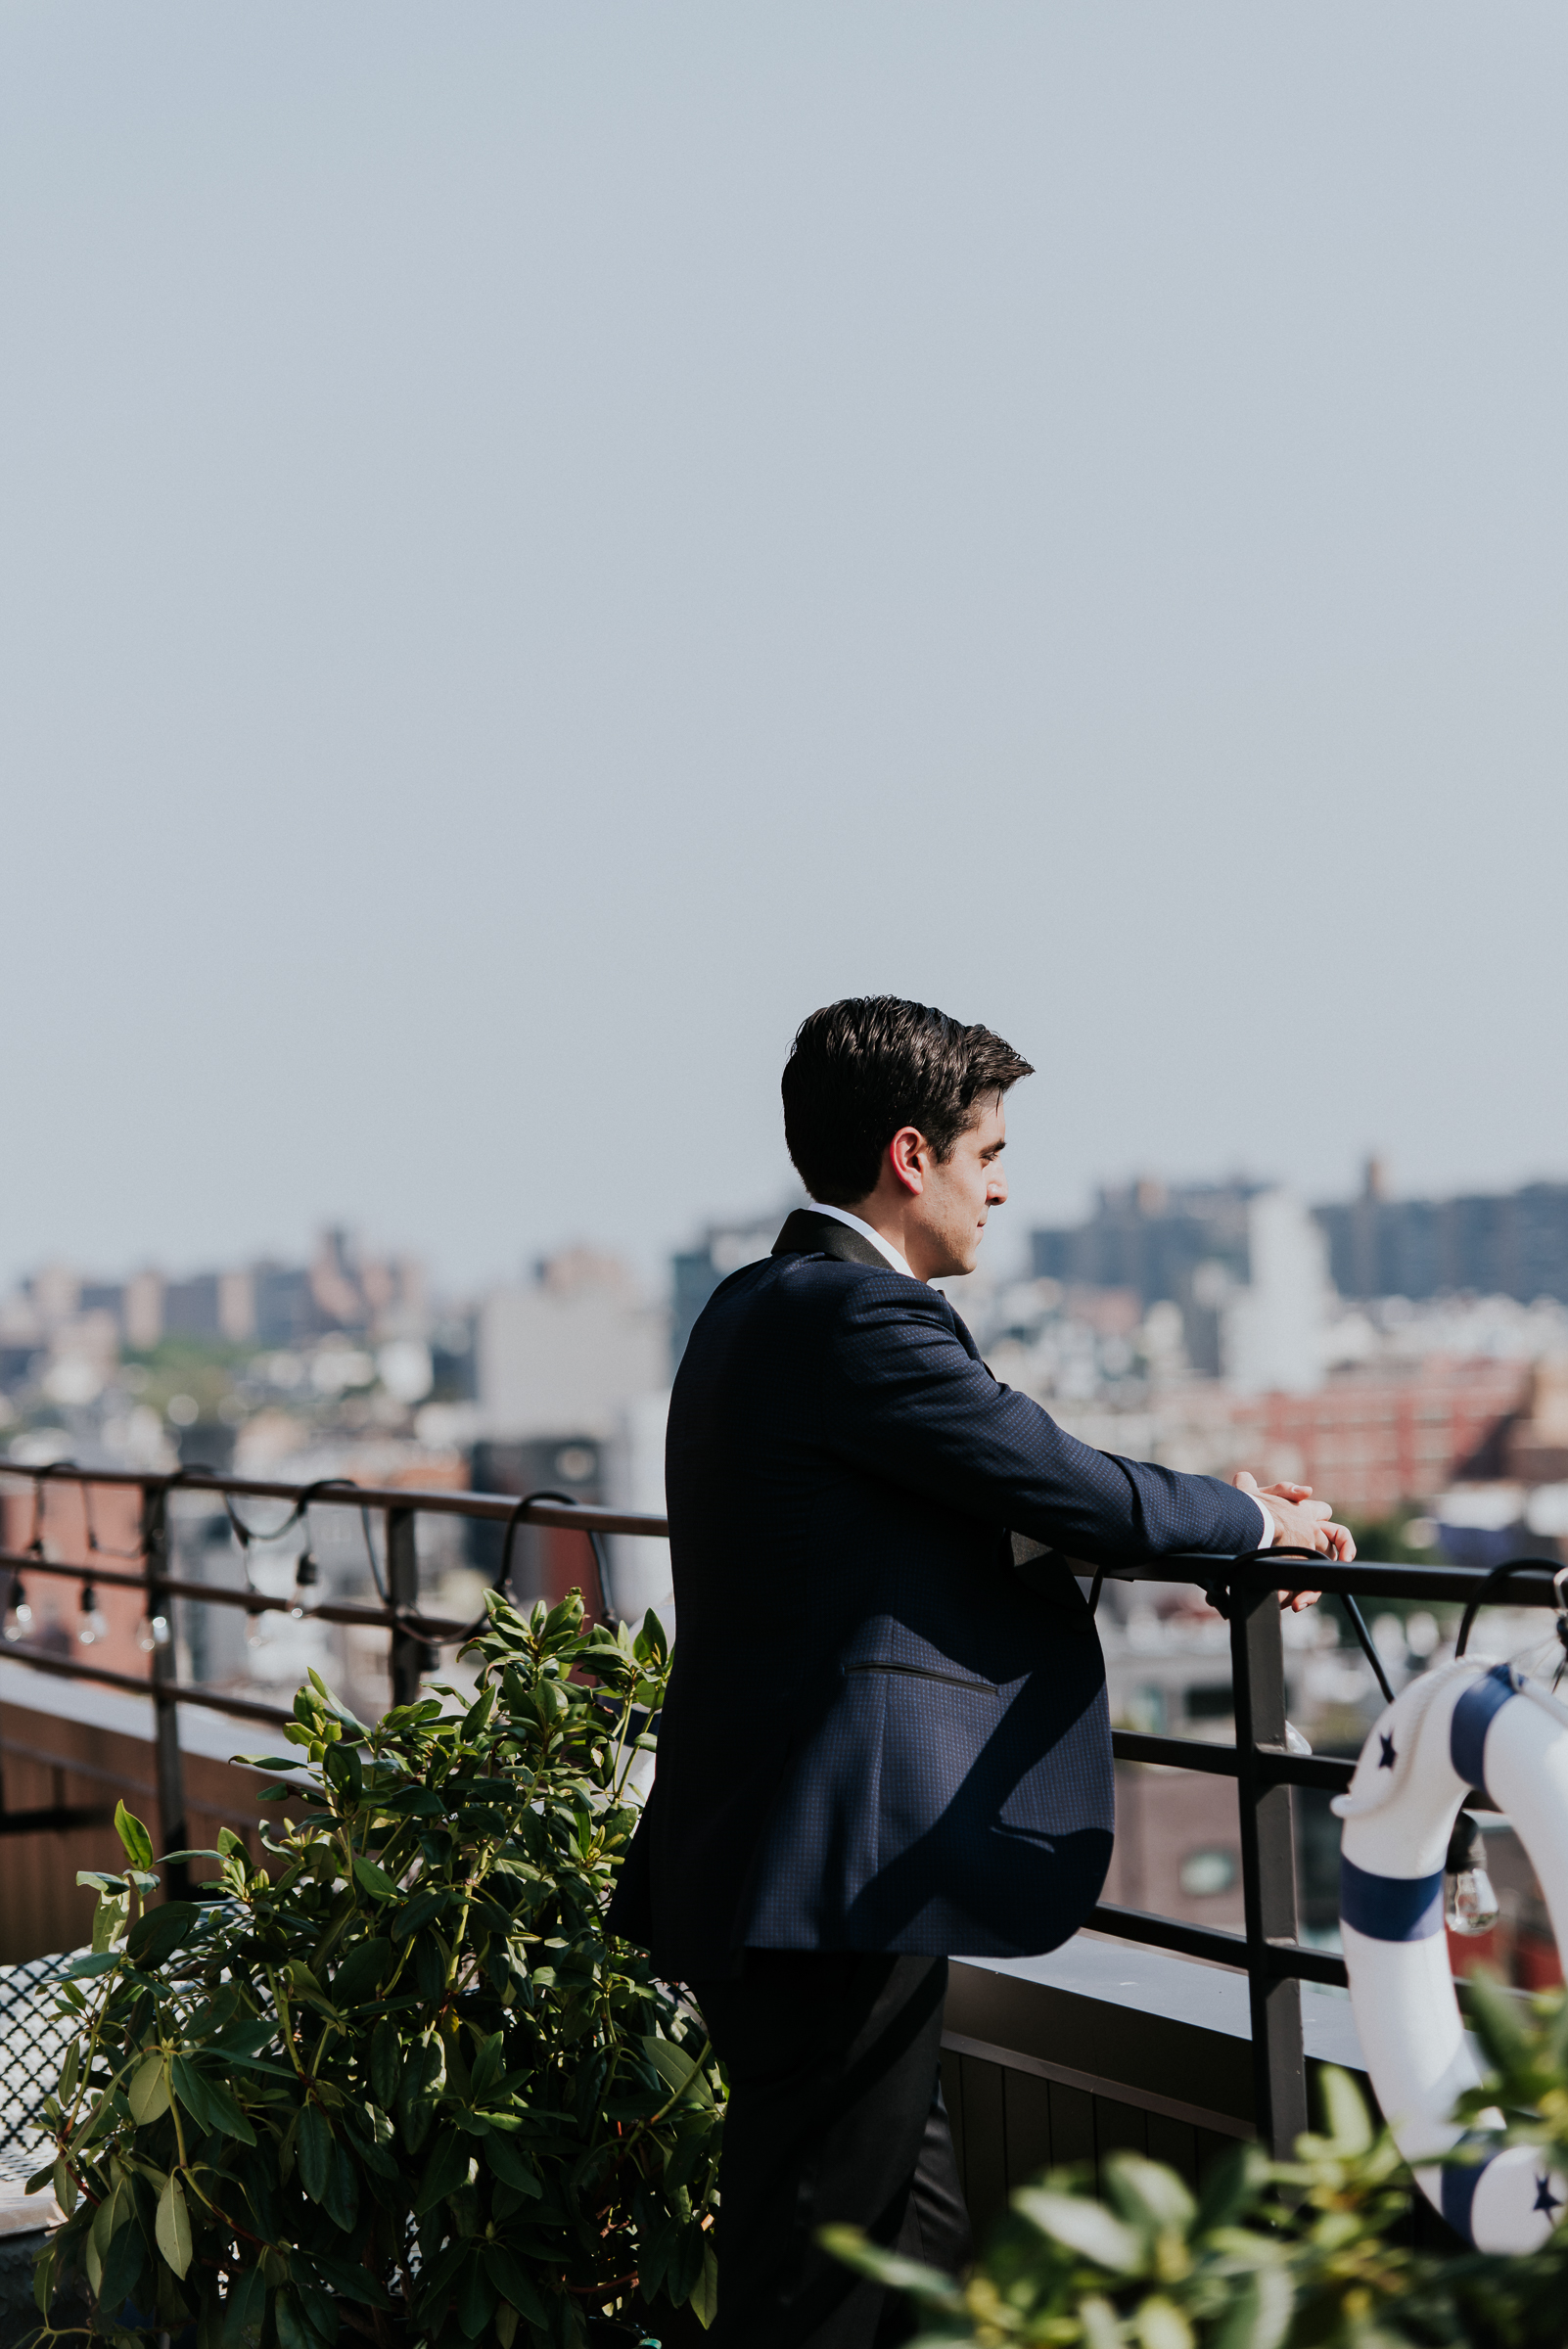 Brooklyn-Winery-NYC-Editorial-Documentary-Wedding-Photographer-Gina-Oli-27.jpg